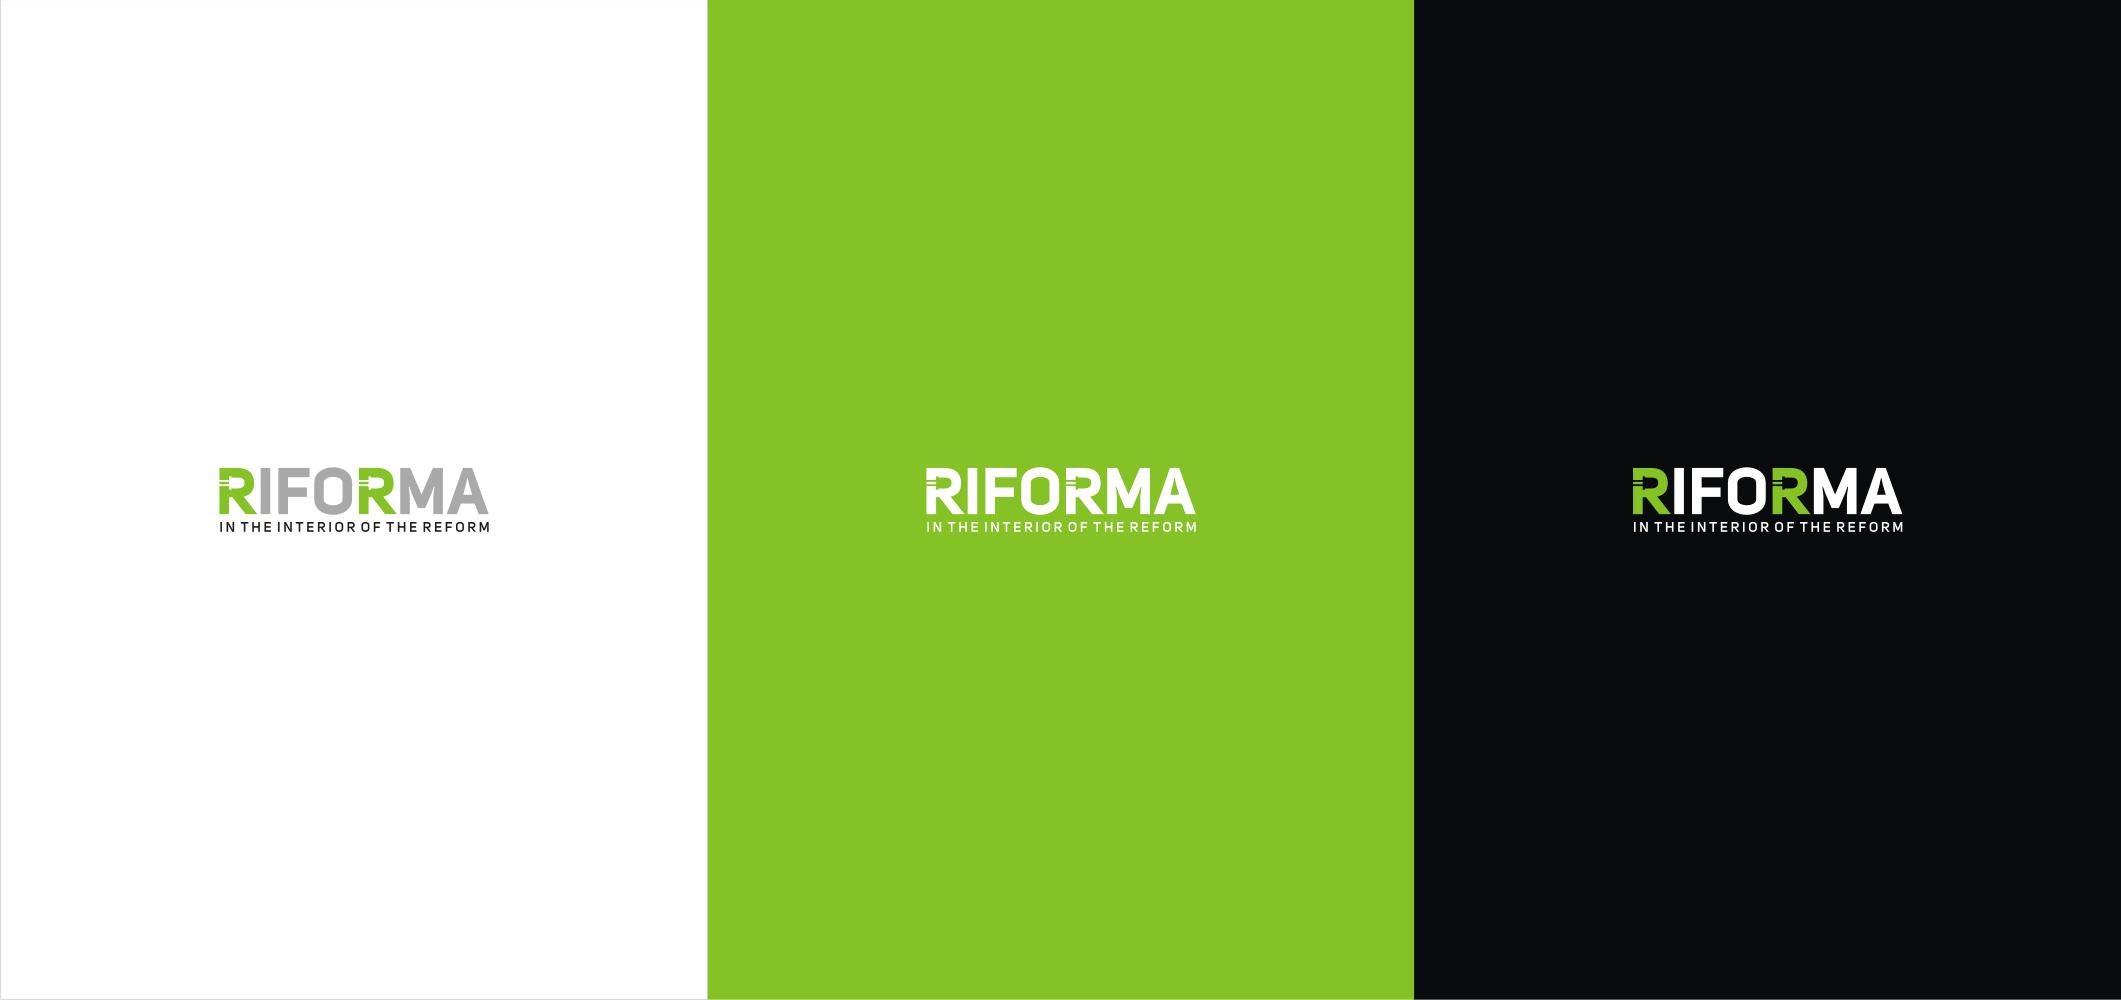 Разработка логотипа и элементов фирменного стиля фото f_27457a618c10afe0.png